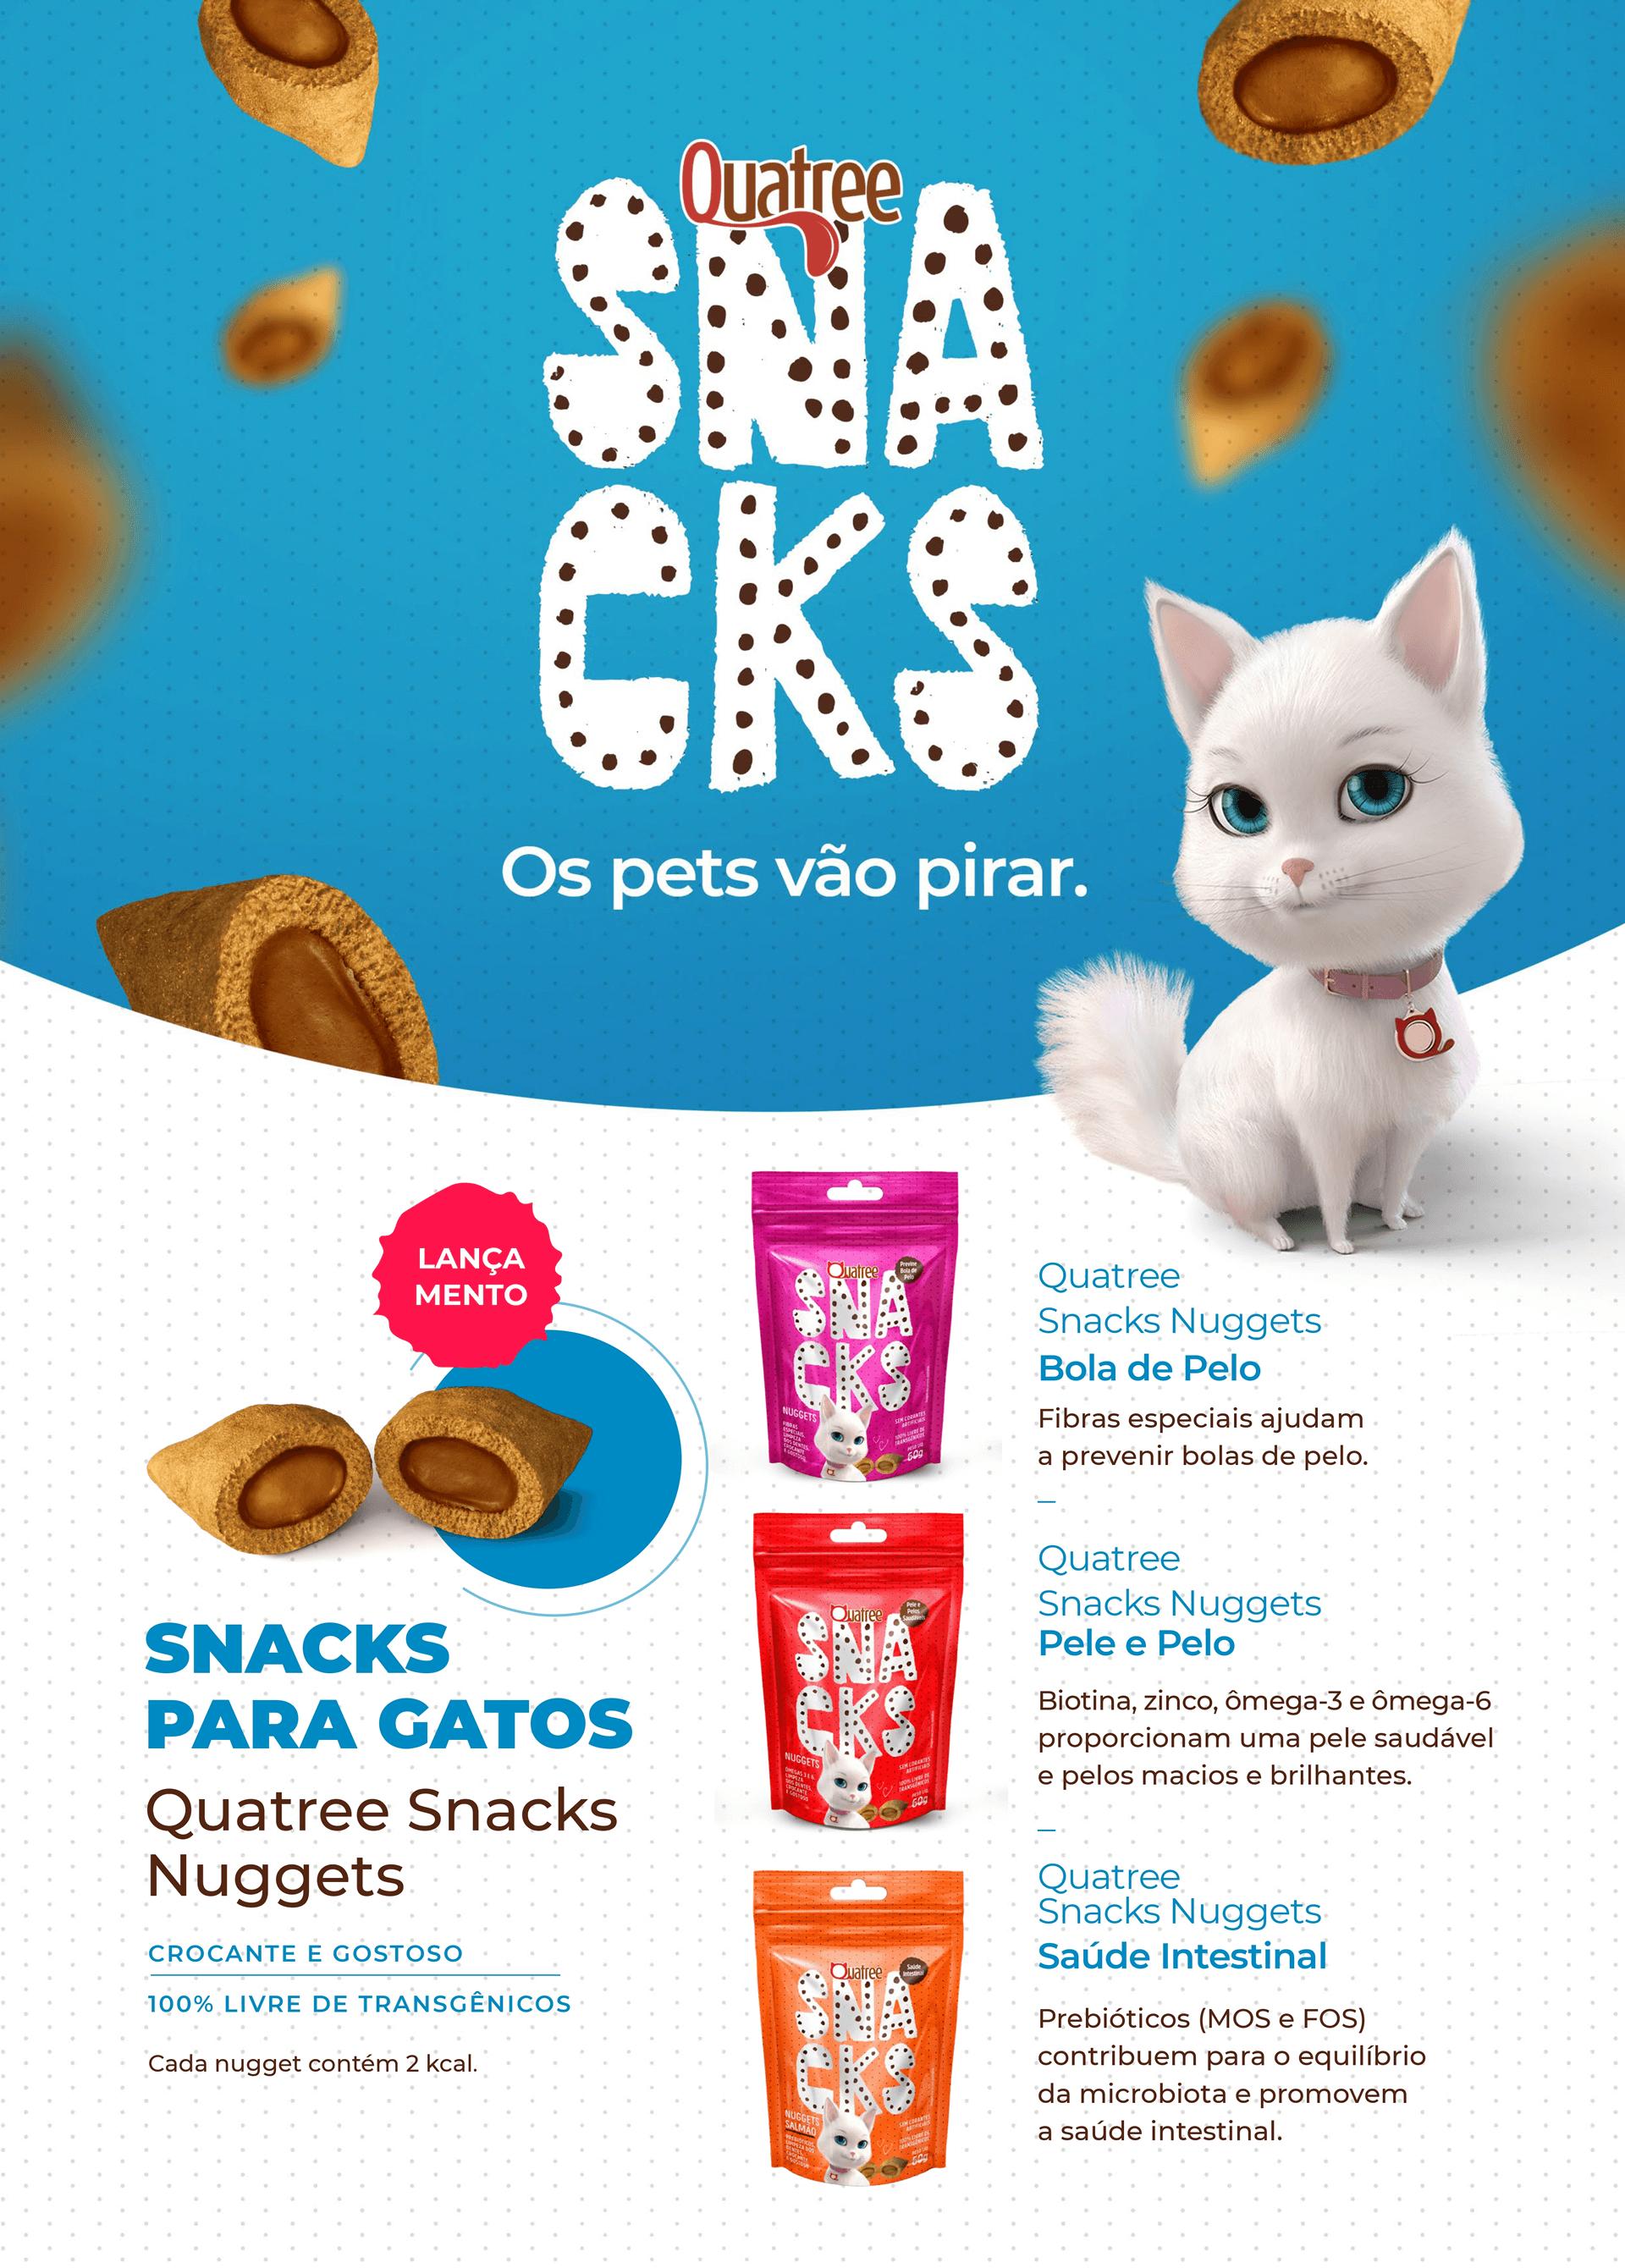 Quatree Snacks